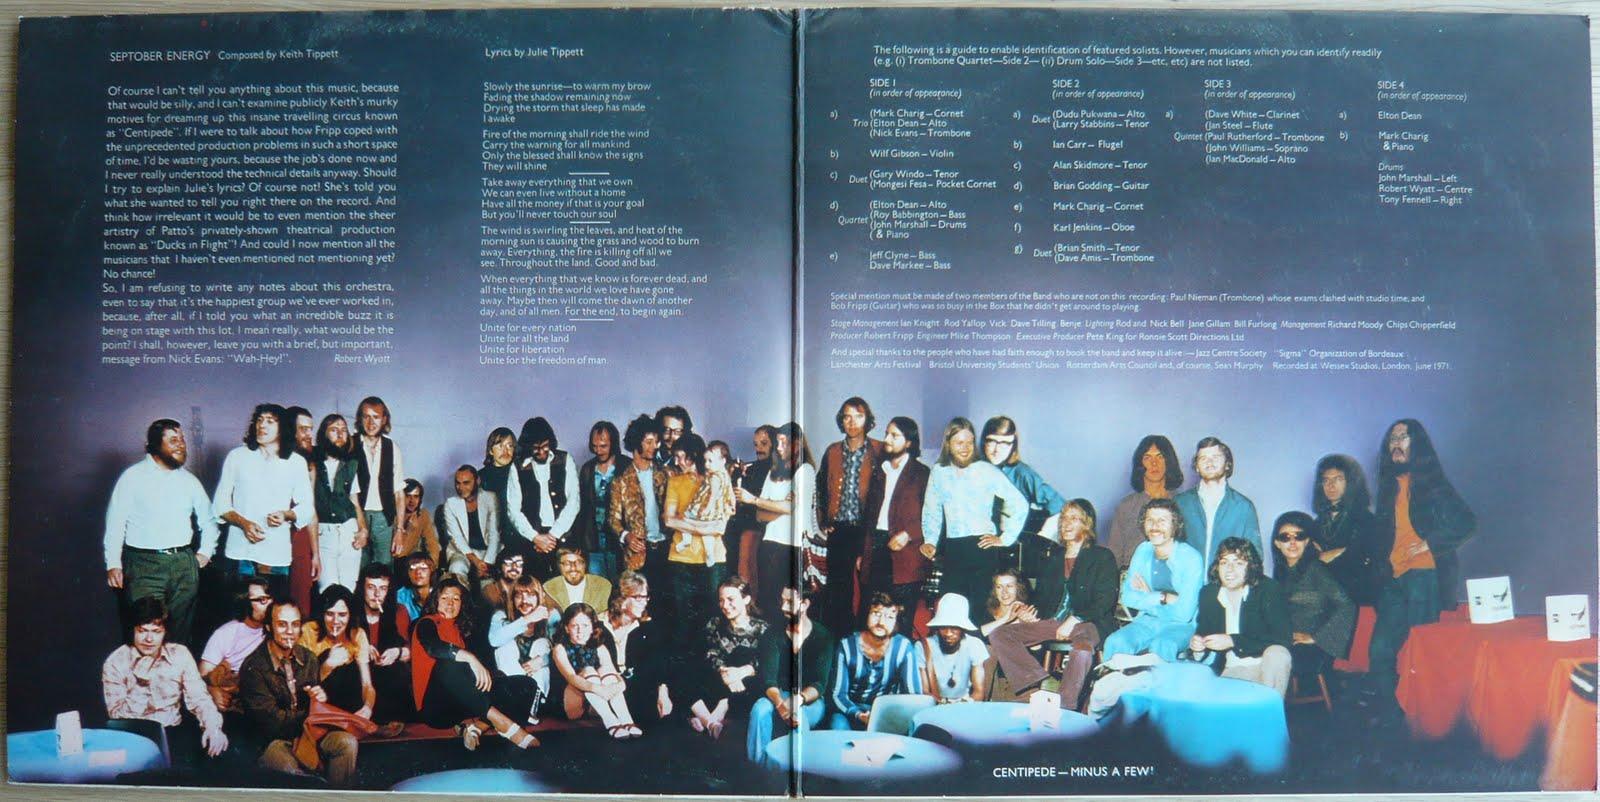 Oh oui, causons jazz (Ziggy) - Page 6 L1090054